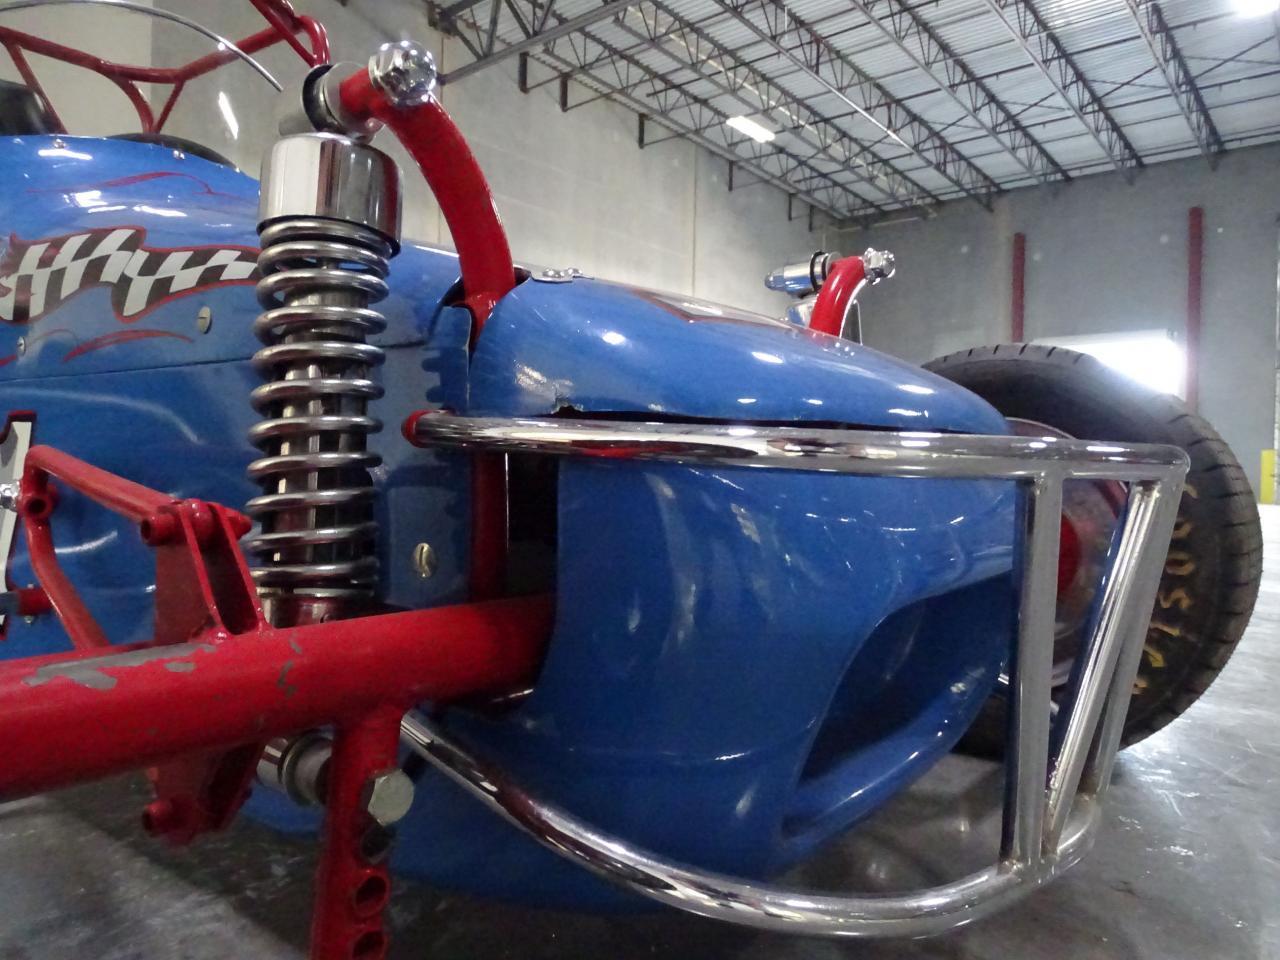 1980 Yamaha Motorcycle (CC-1342741) for sale in O'Fallon, Illinois